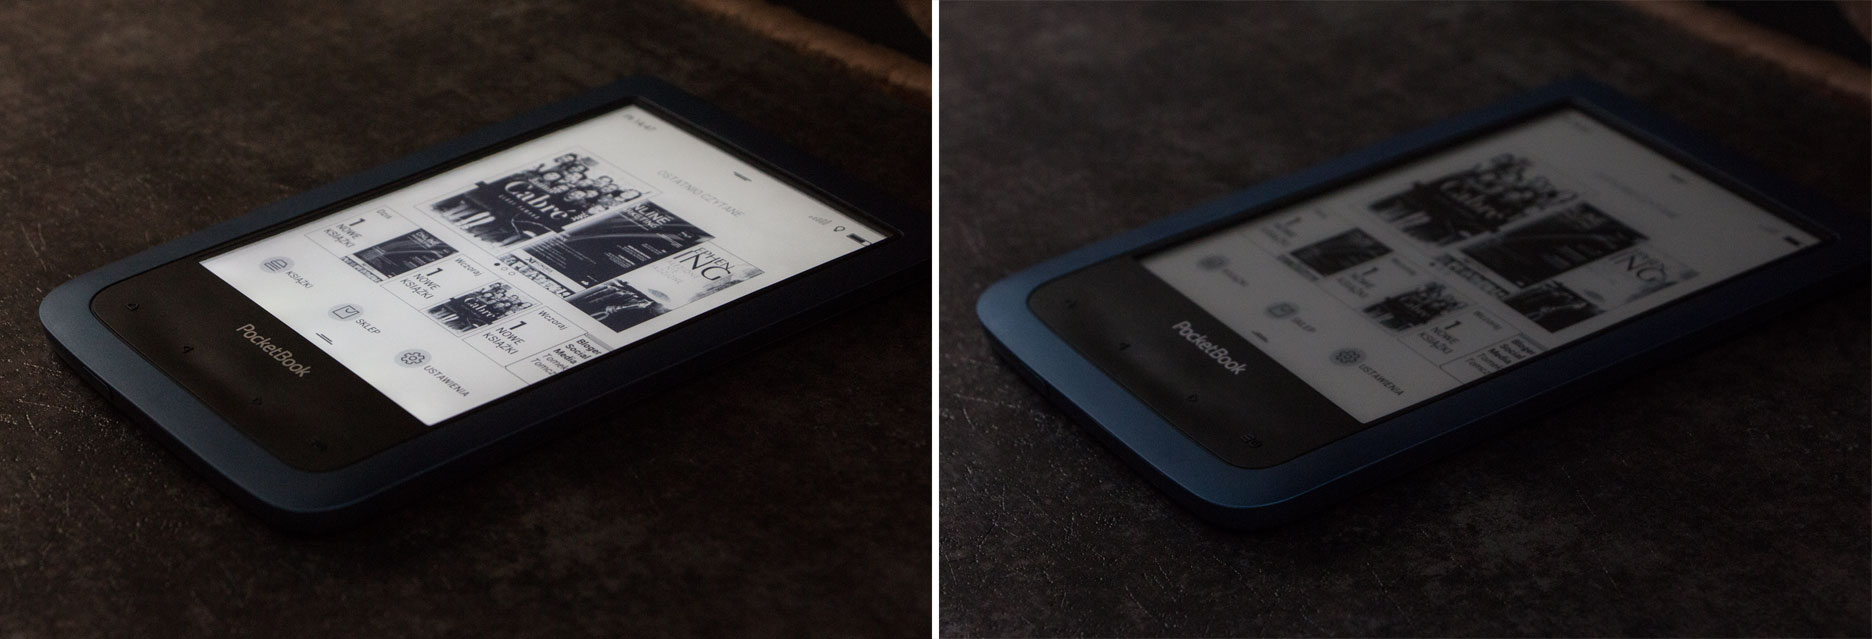 PocketBook Aqua 2 doświetlenie ekranu